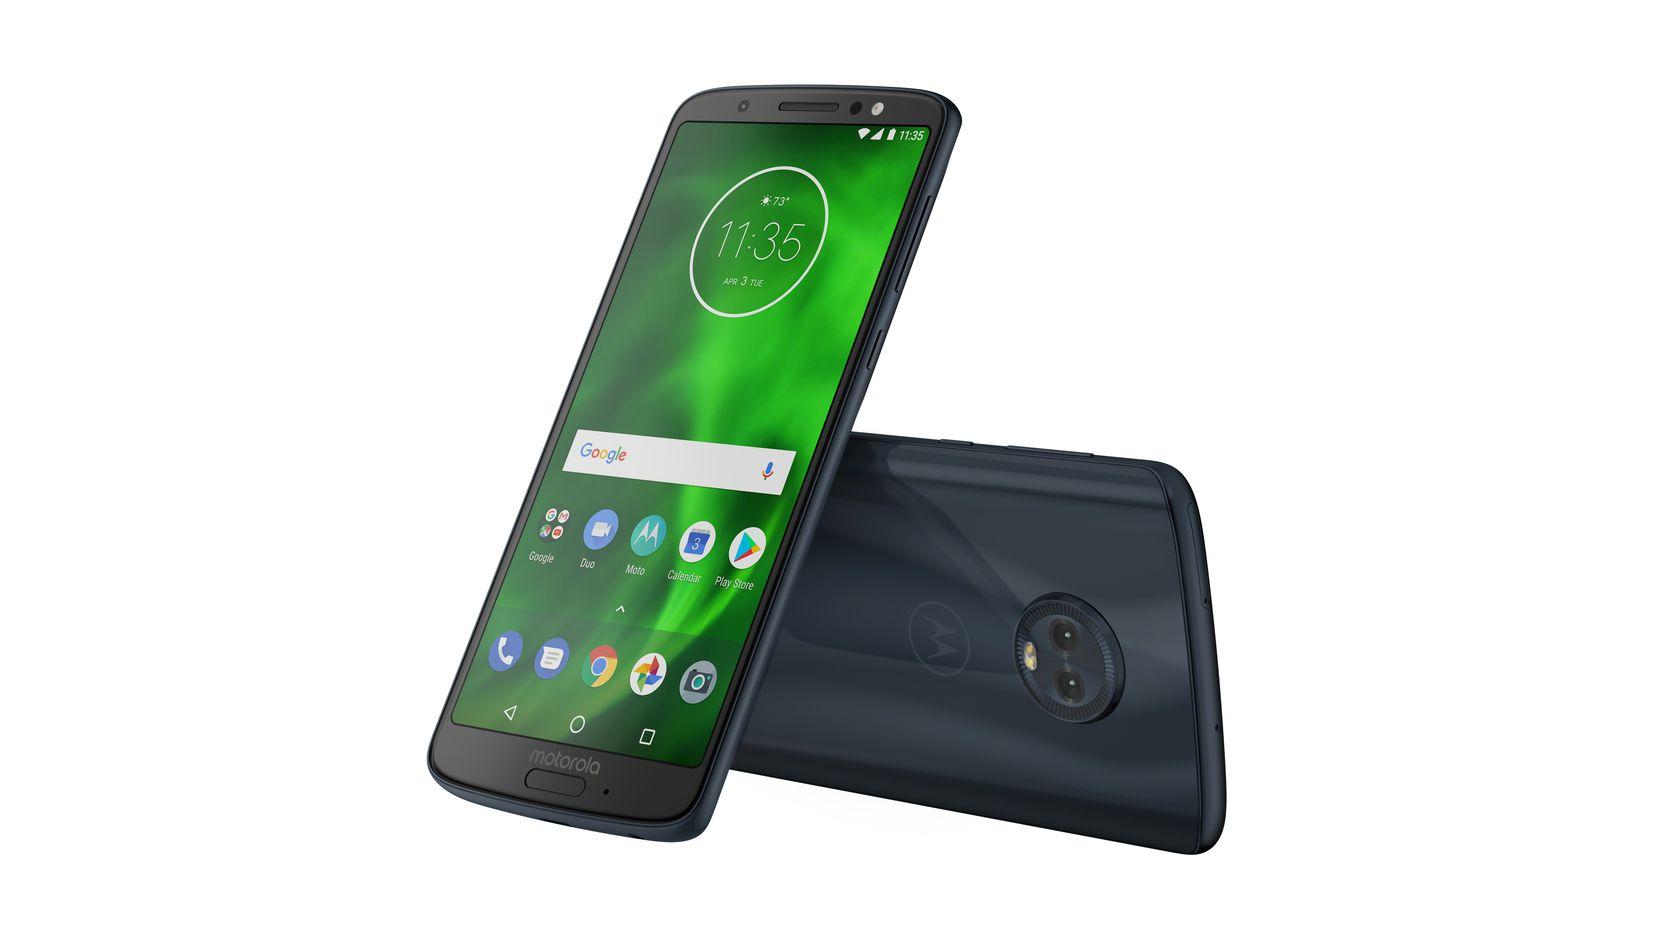 The Motorola Moto G6 Amazon Prime Exclusive edition